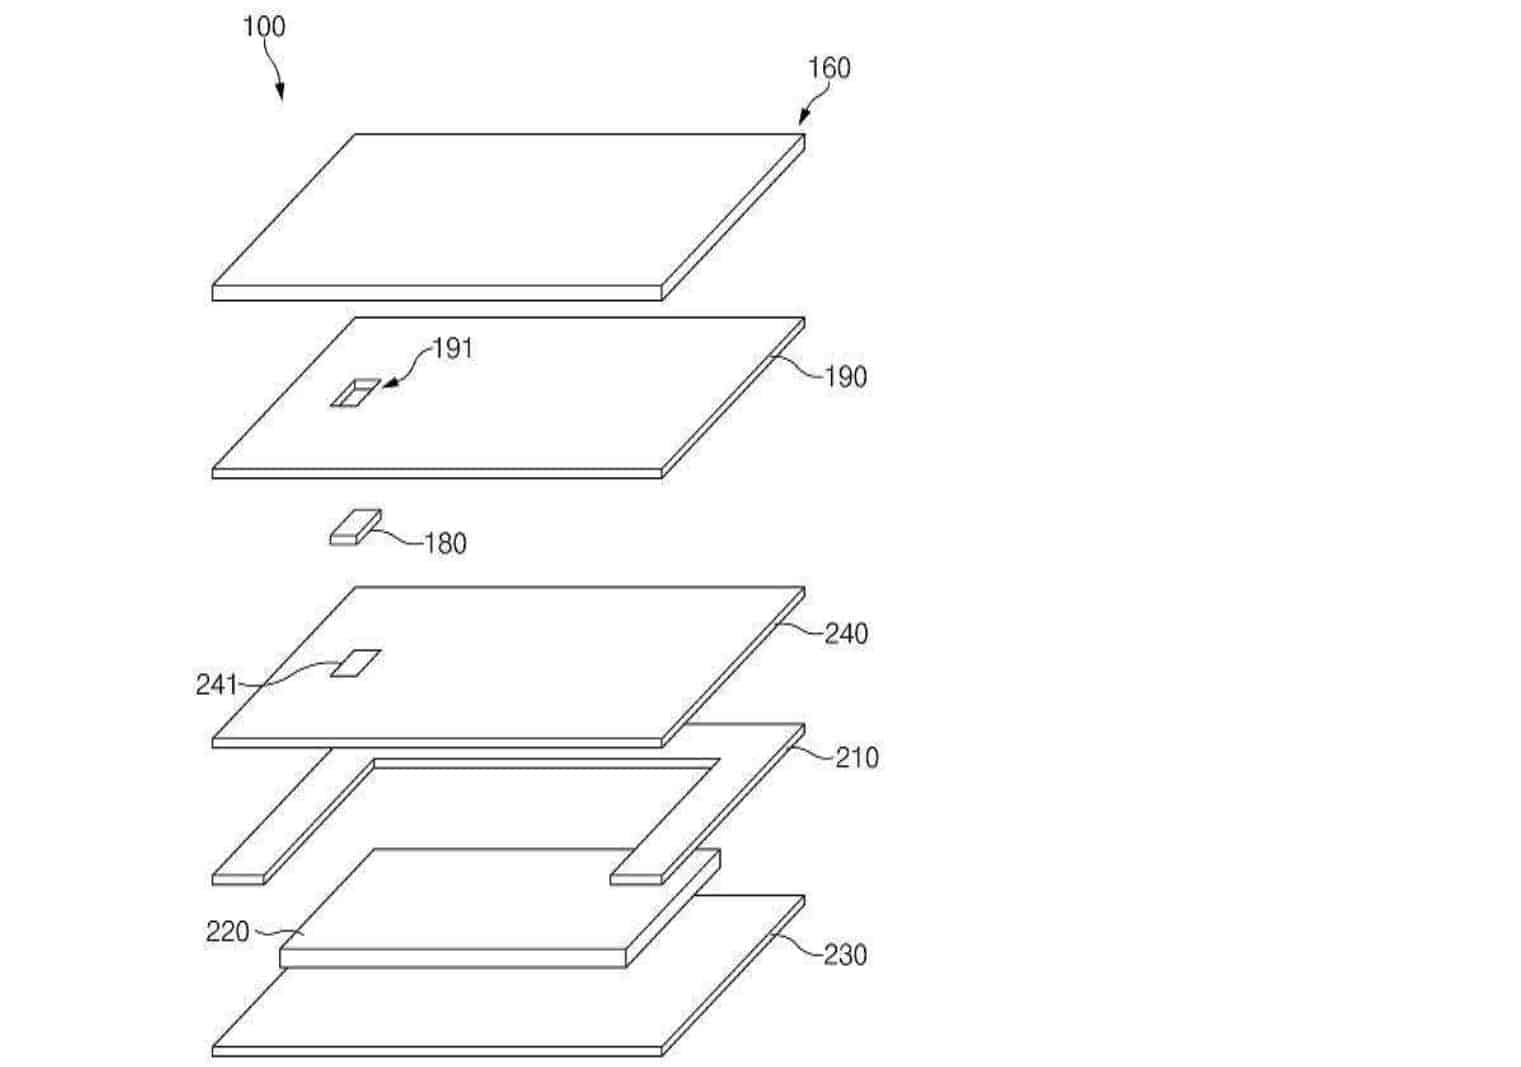 Samsung Pressure Sensitive On screen Fingerprint Reader KIPRIS 2